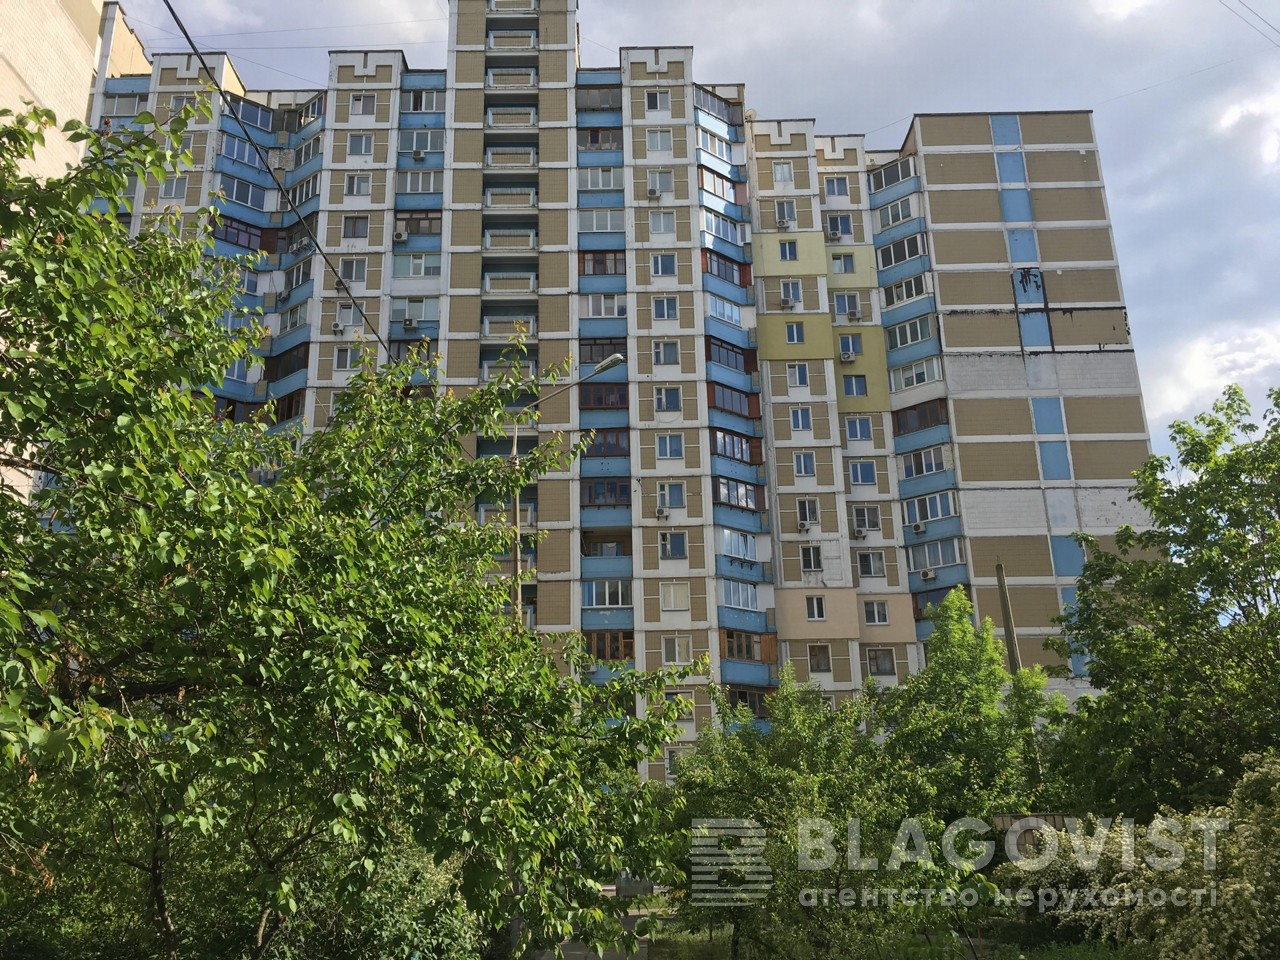 Квартира R-37151, Милославська, 31б, Київ - Фото 2